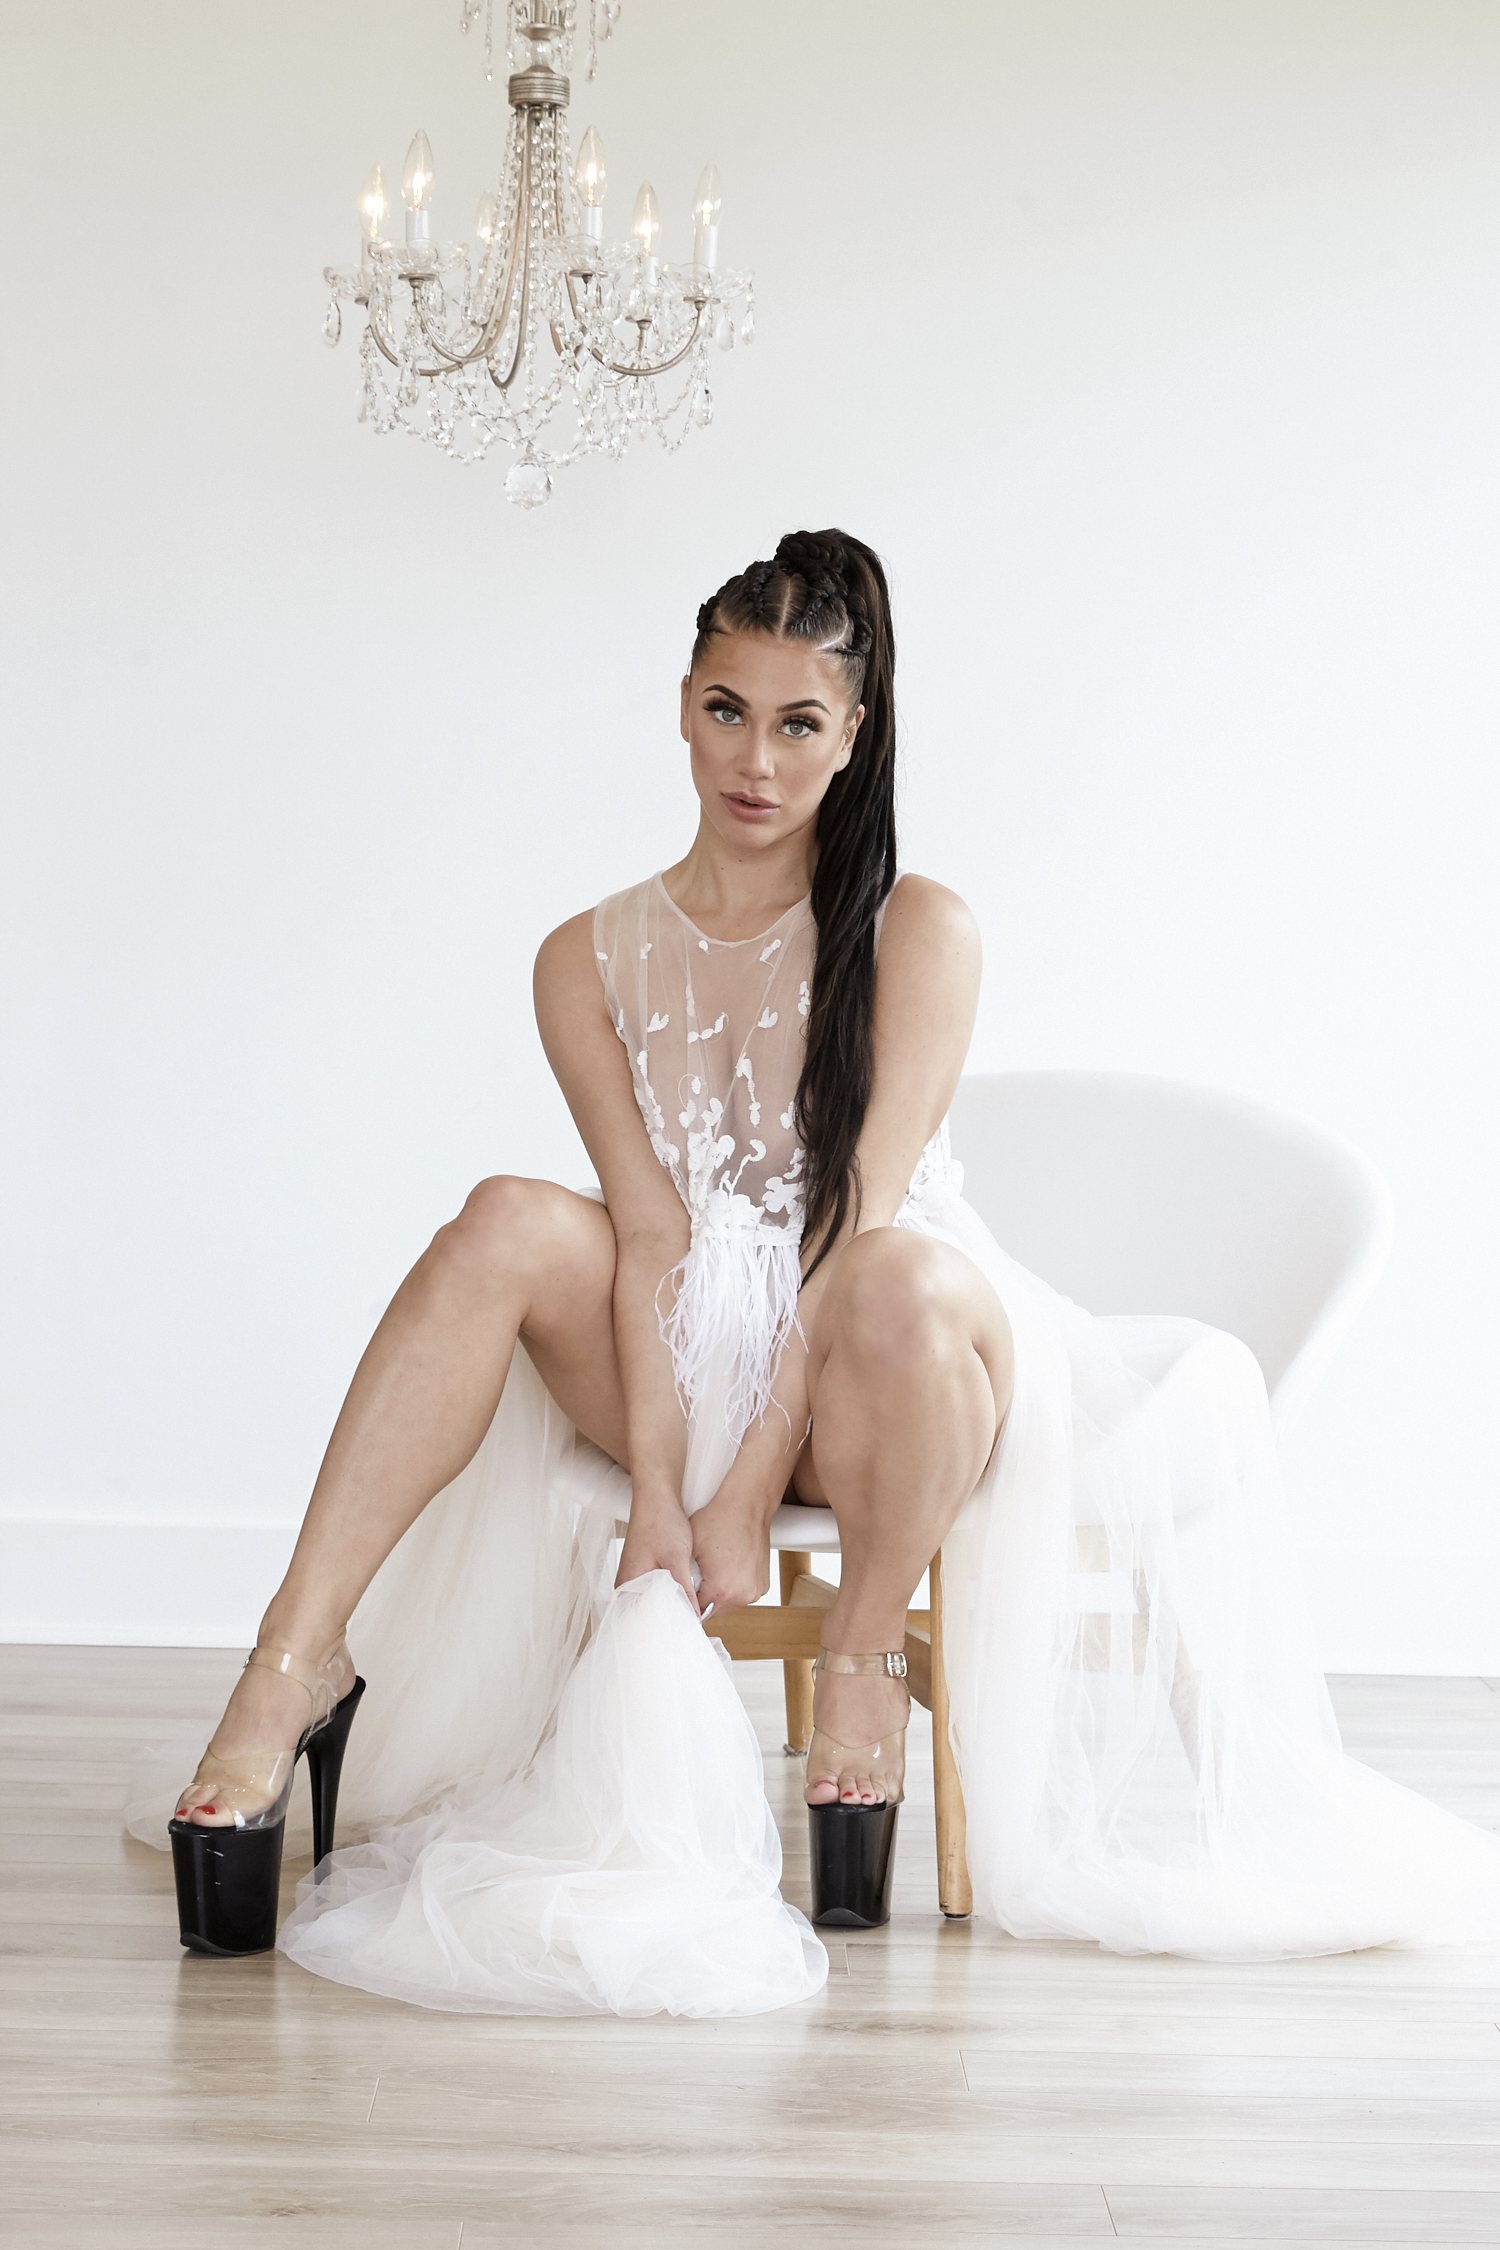 cindy-moleski-professional-boudoir-glamour-photographer-sasaktoon-saskatchewan-20544-002e.jpg